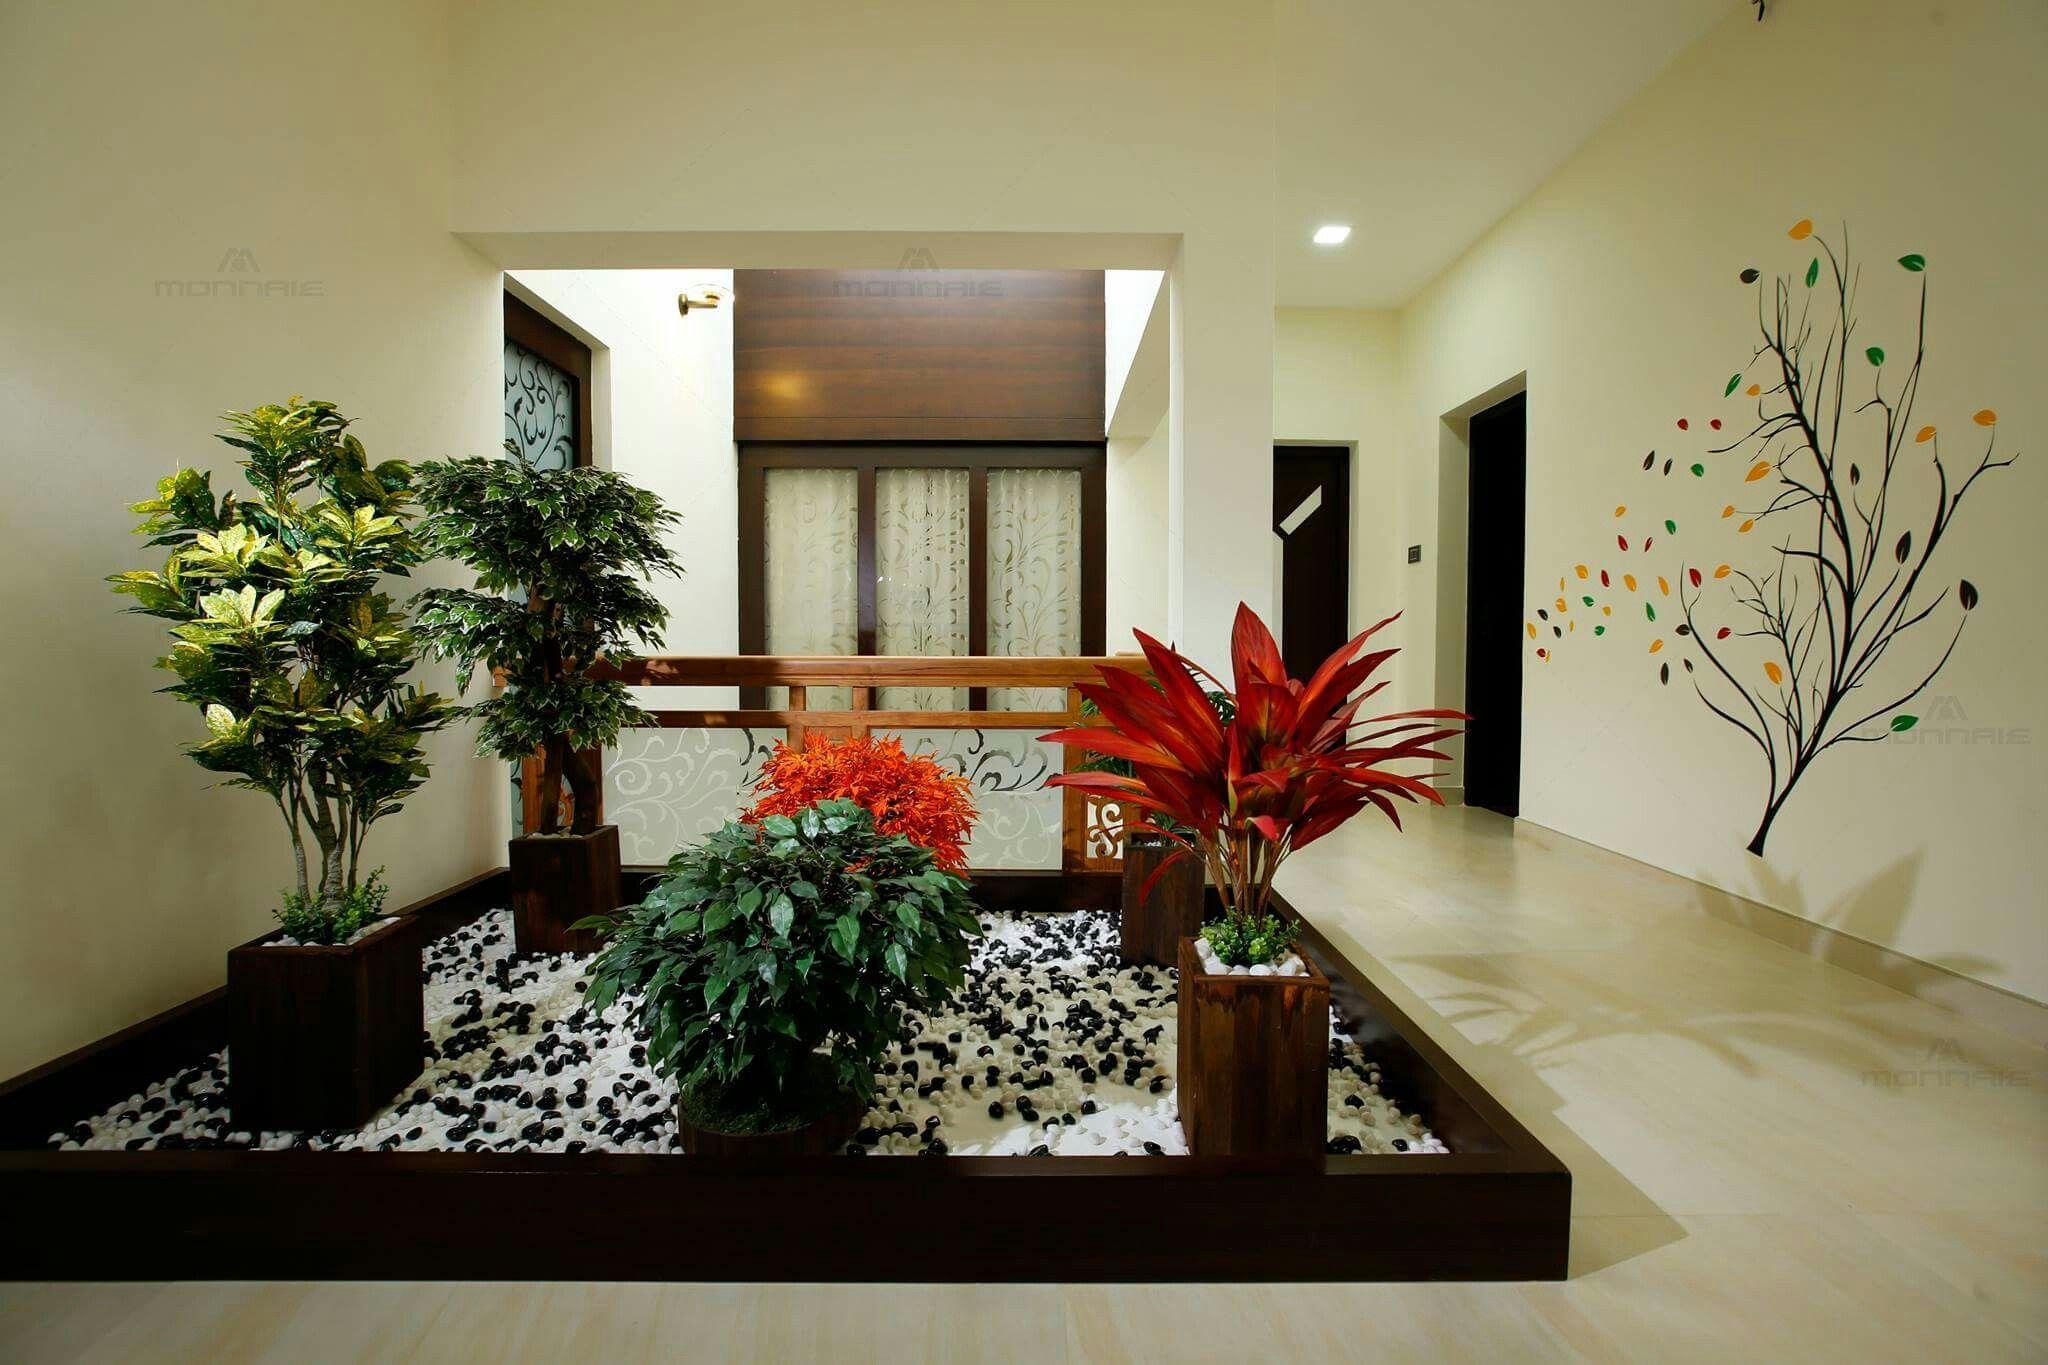 D'life home interiors kochi kerala pin by santosh chakravarthy on nalakettu  pinterest